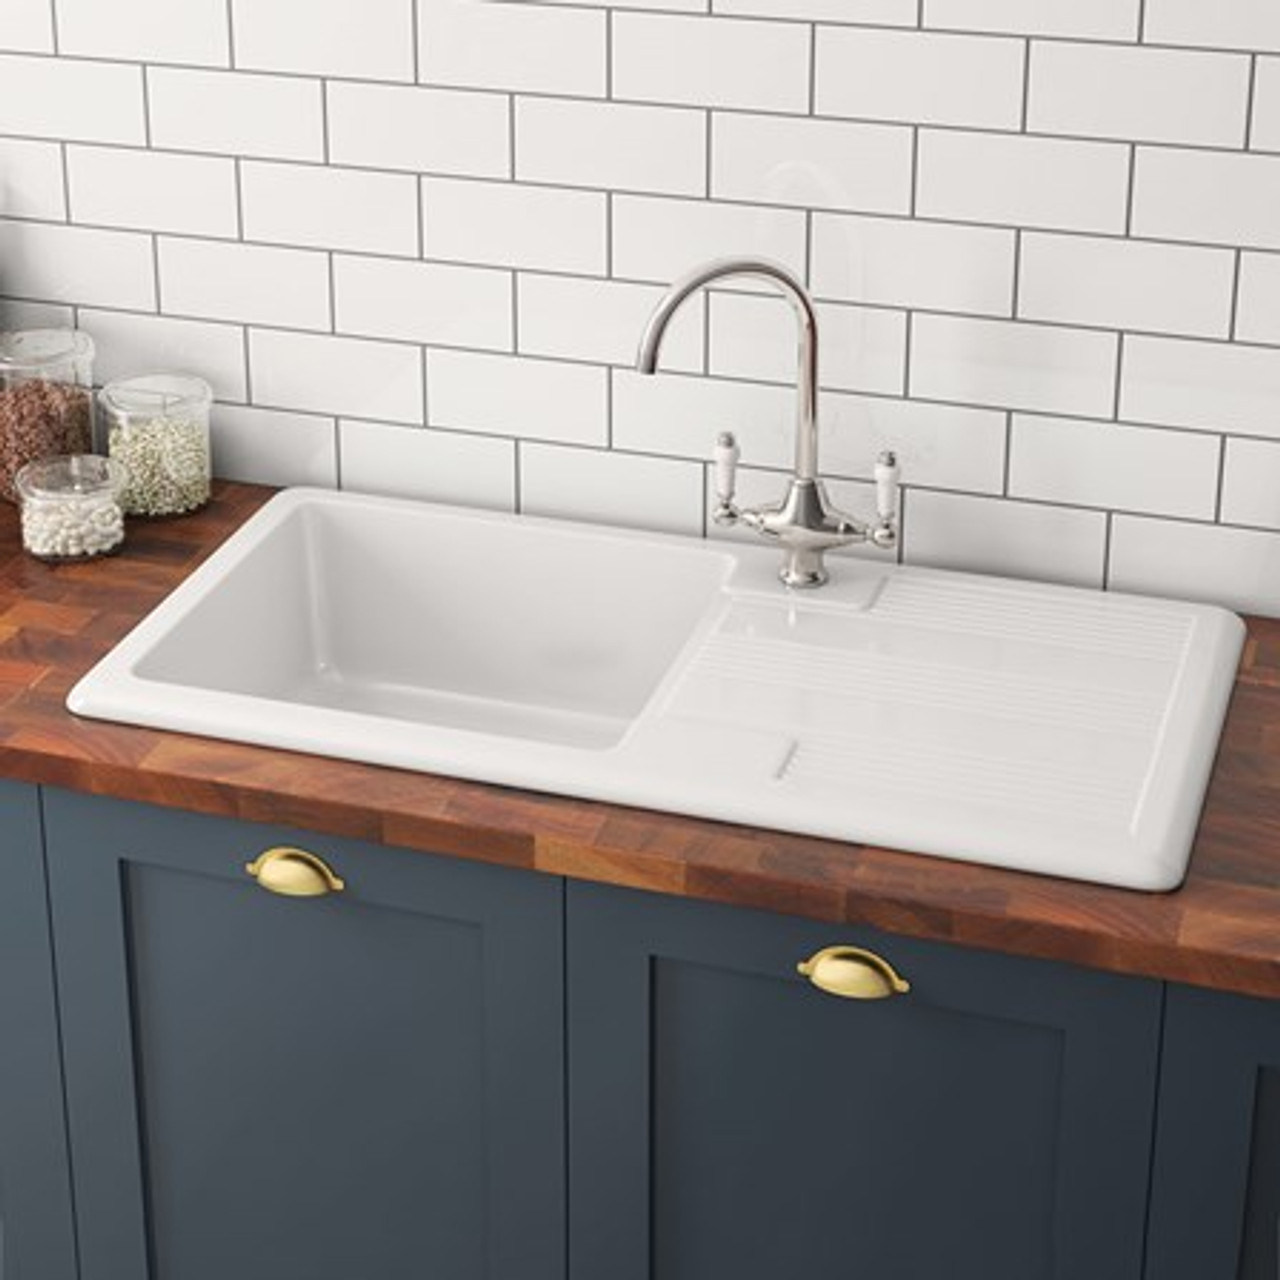 Brass & Traditional Sinks Rivendale Ceramic Kitchen Sink - Sinks